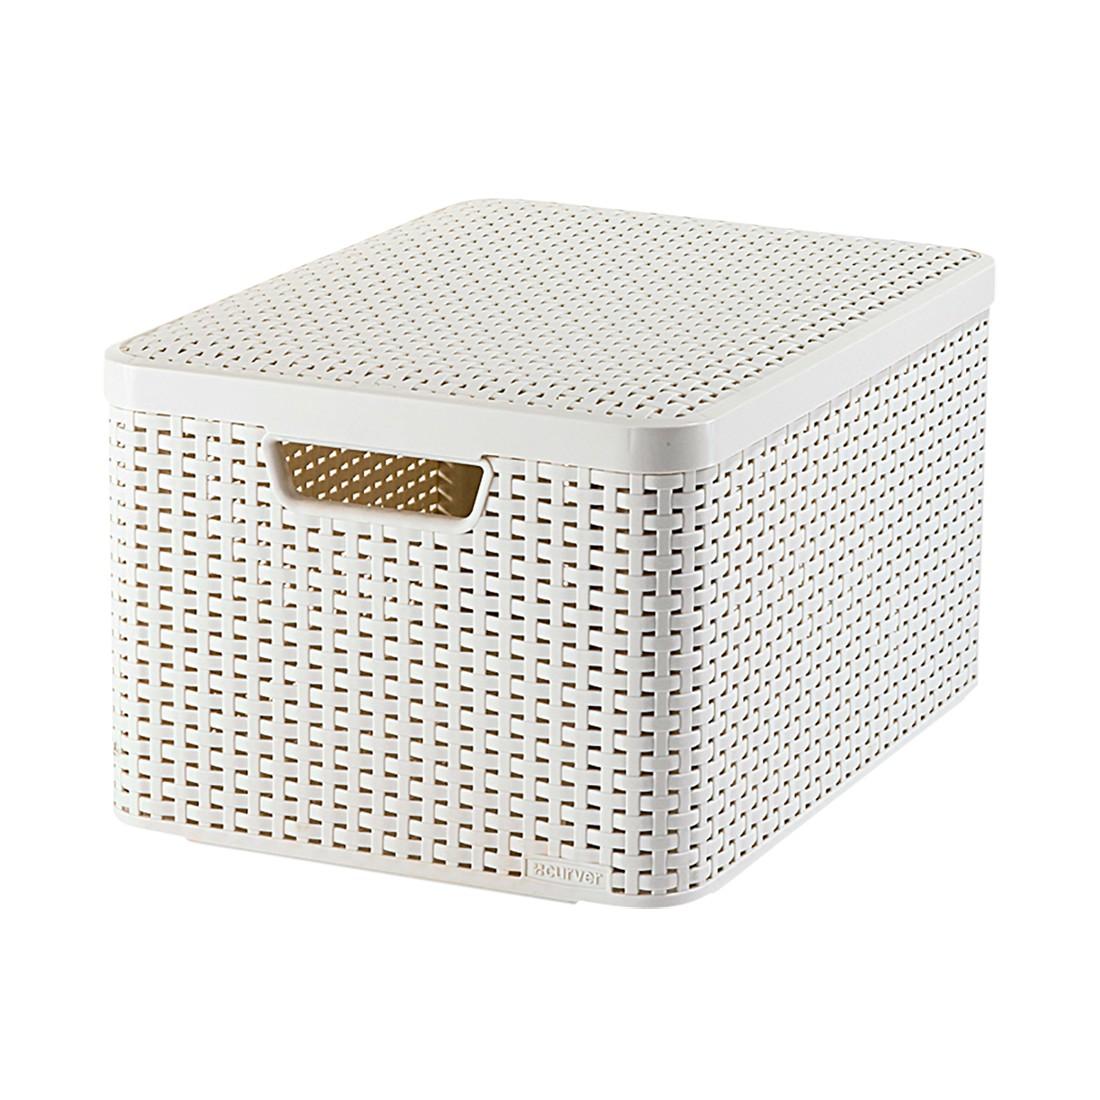 Box Style – Kunststoff Cremé – 29,3 cm 18 Liter 18,7 cm 39,3 cm, Curver günstig bestellen